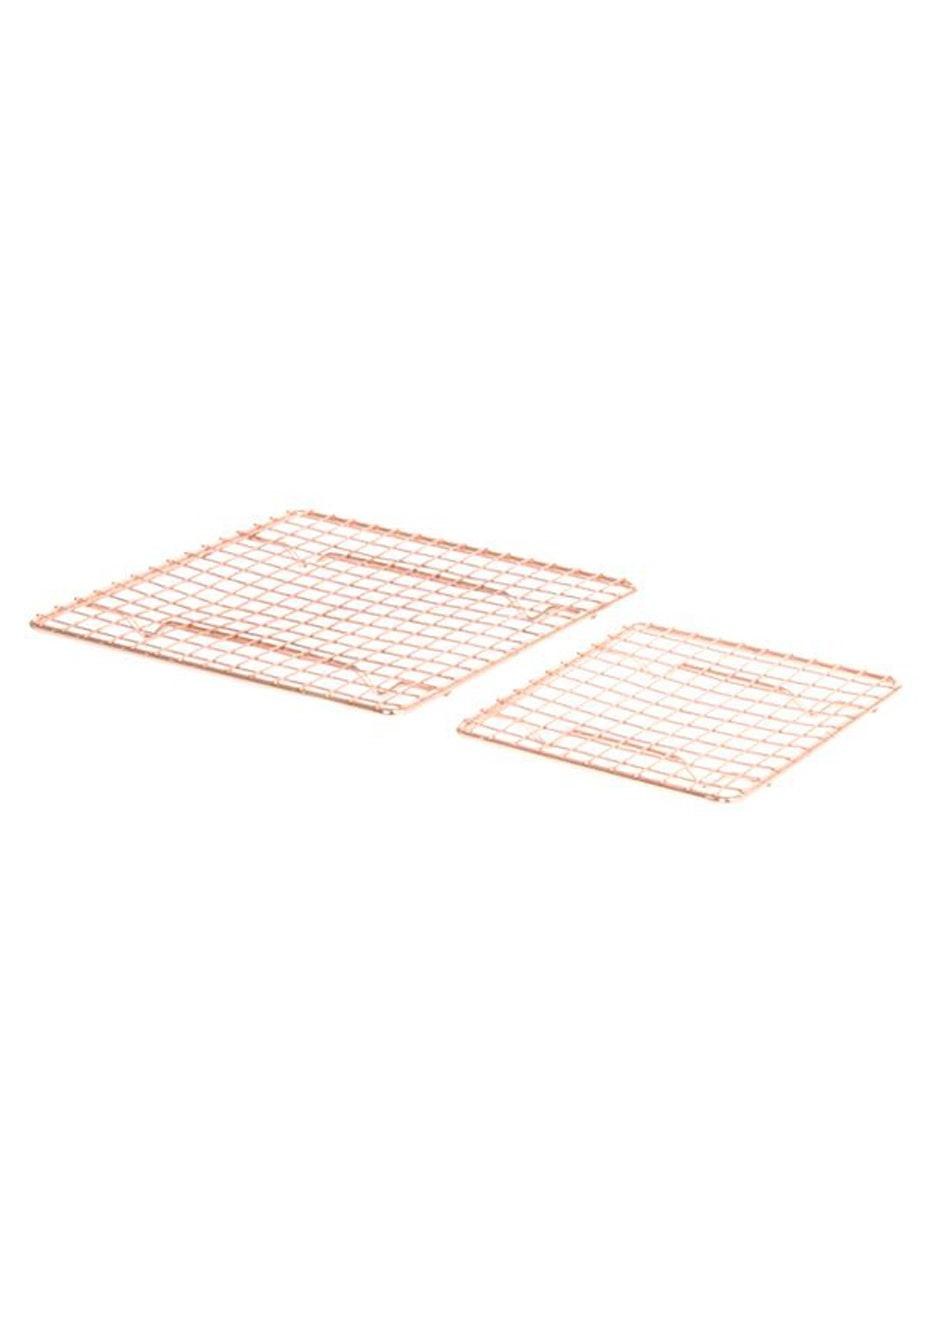 Pt Home - Set of 2 Trivet 'Wired Raster' - Copper